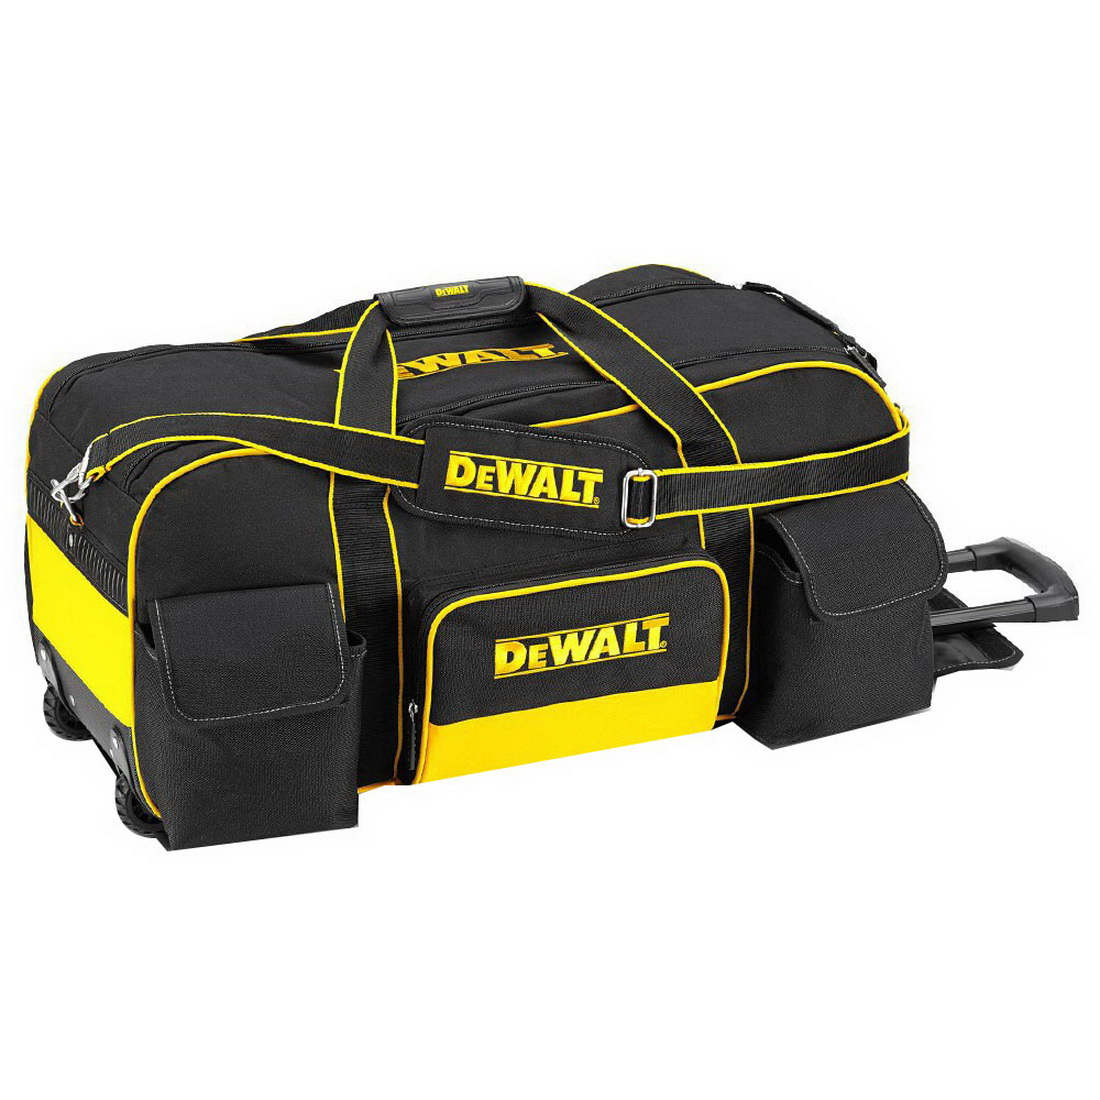 685 x 330 x 285mm 12 Pocket Heavy Duty Wheeled Power Tool Bag